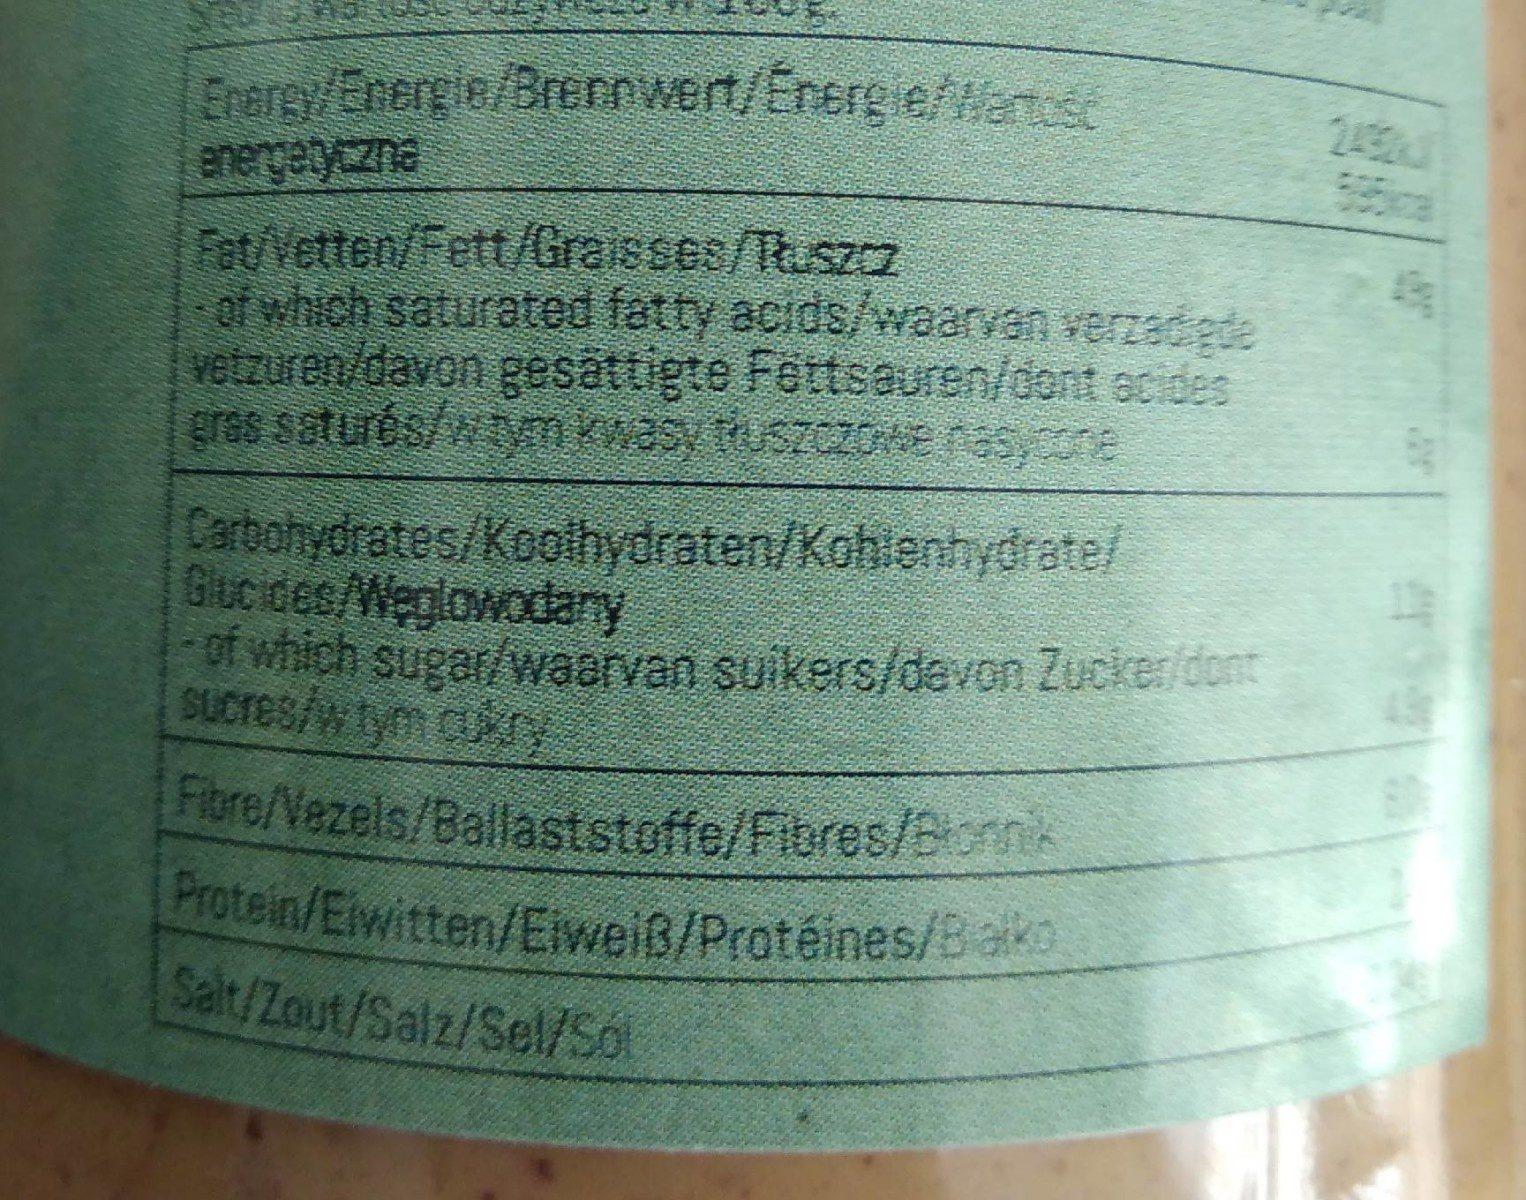 Beurre de noix mélangées - Voedingswaarden - fr